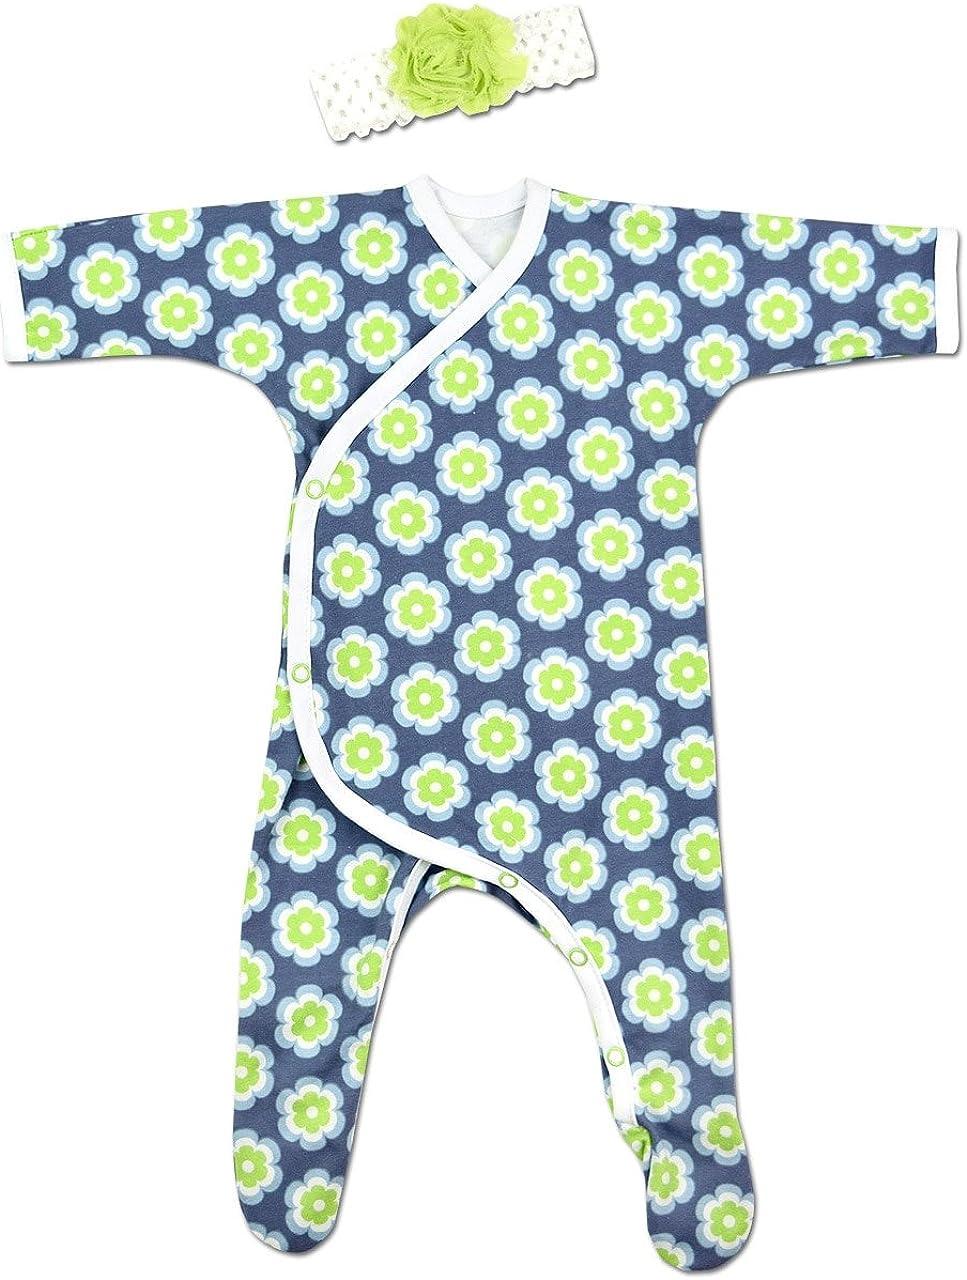 Perfectly Preemie Boys Girls Special It is very popular sale item Playsuit